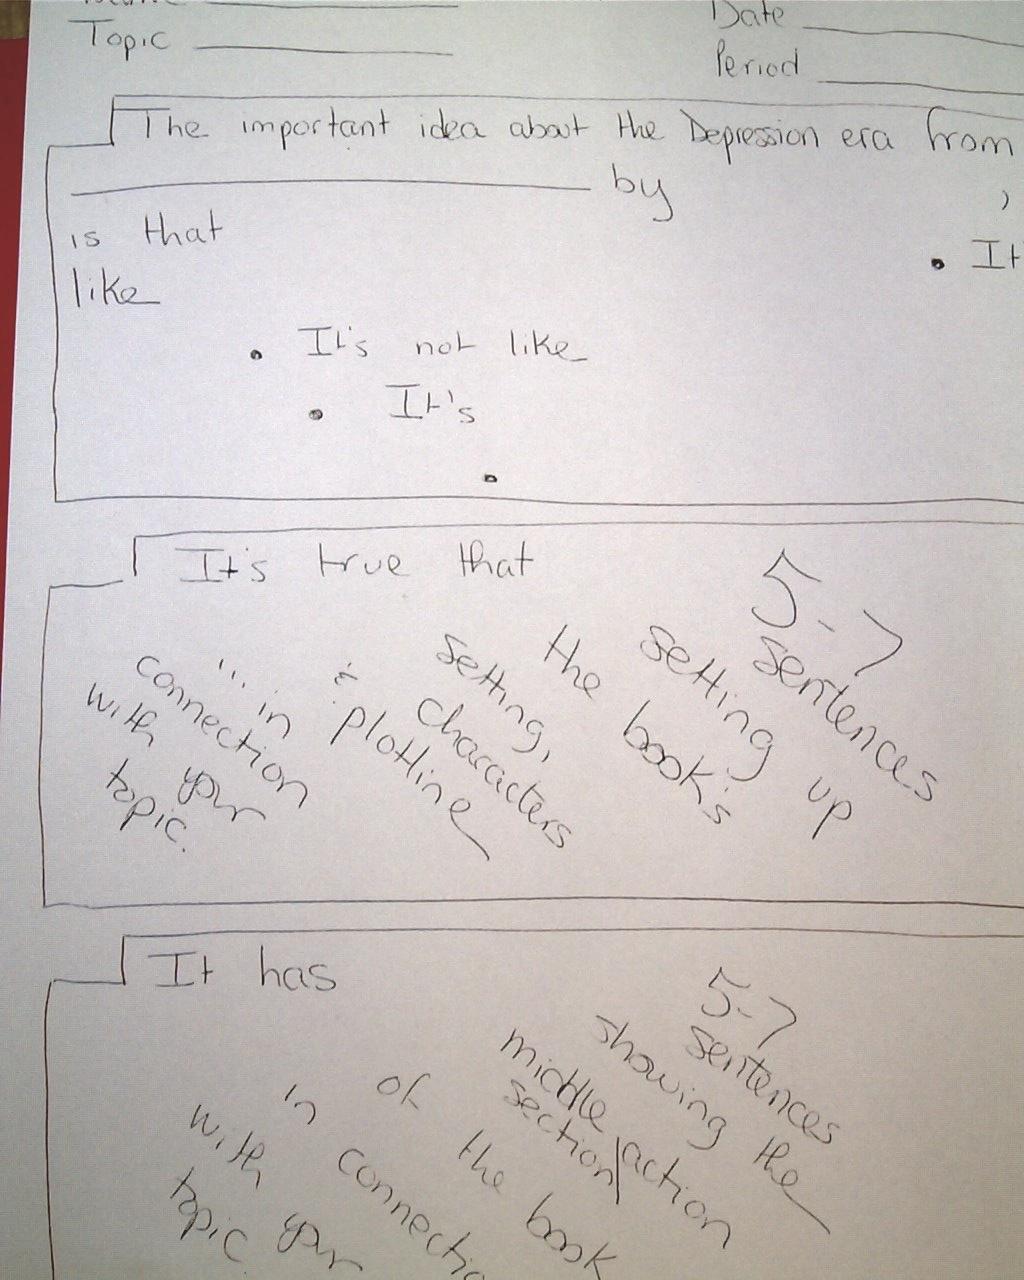 12 point type essays